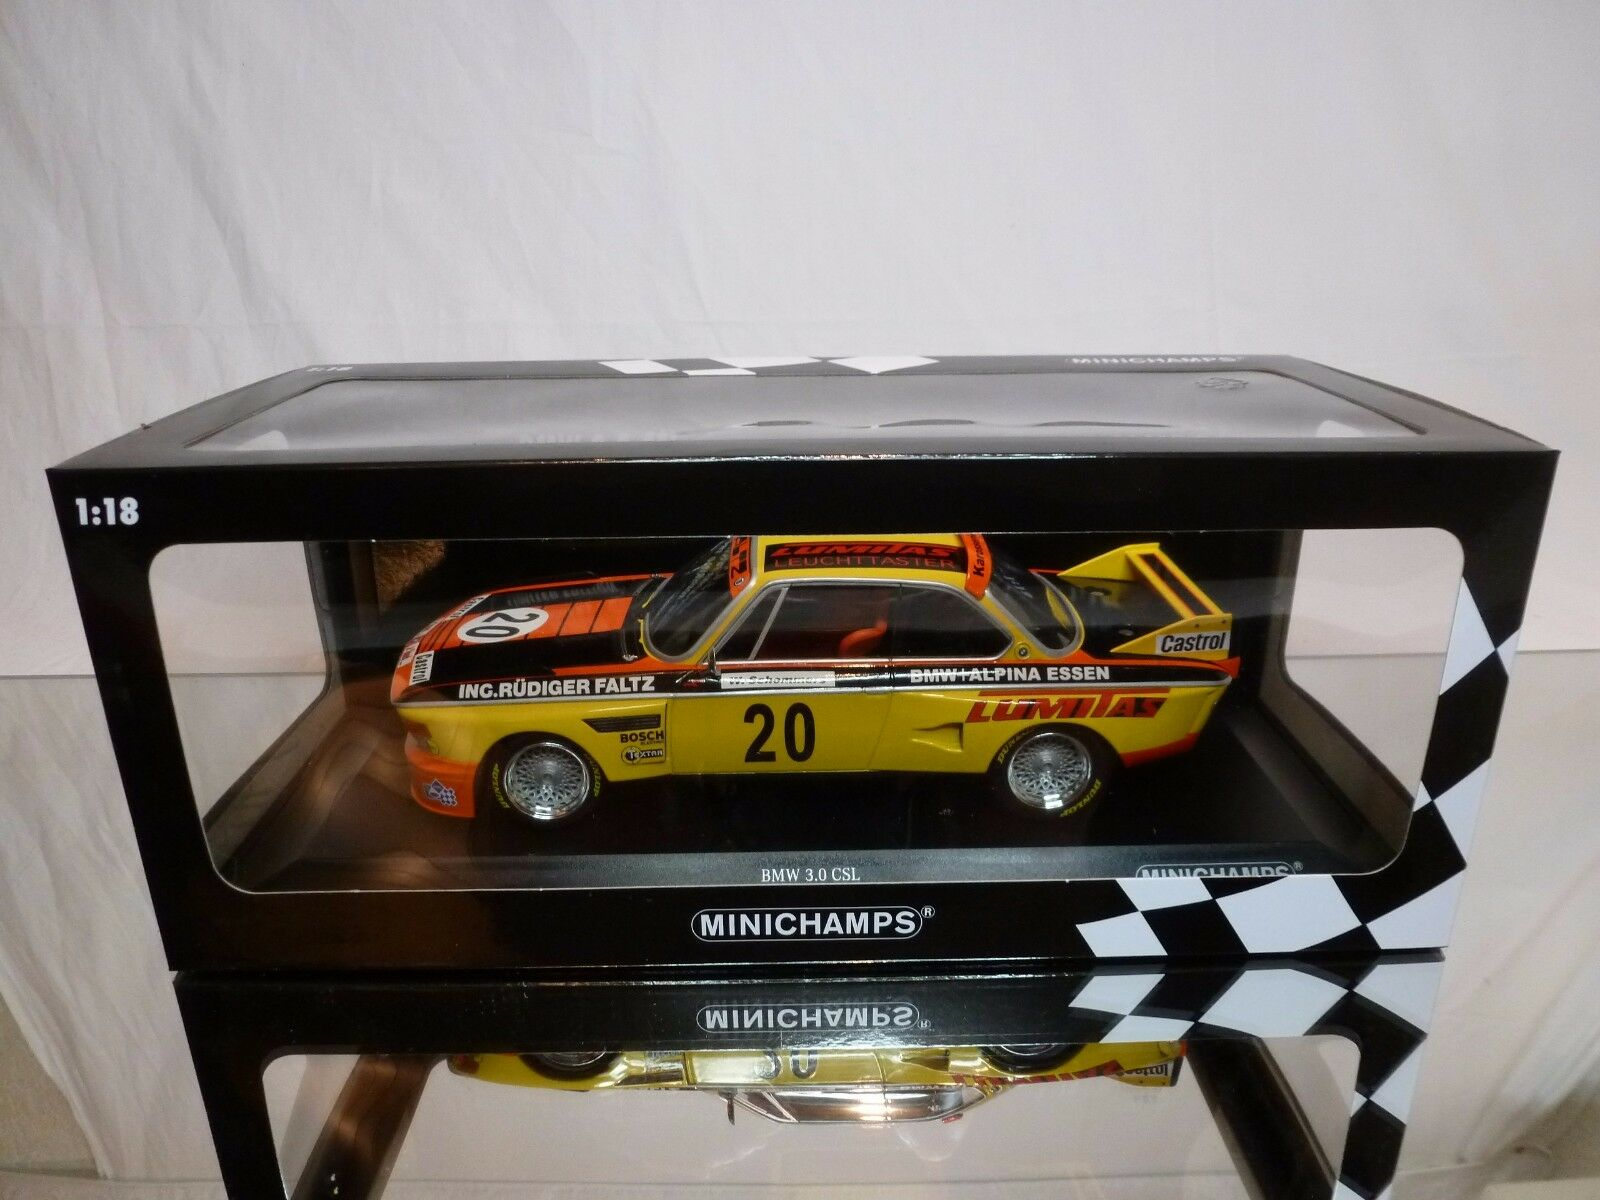 MINICHAMPS 742620 BMW 3.0 CSL - FALZ ALPINA - Gelb 1 18 RARE- EXCELLENT IN BOX